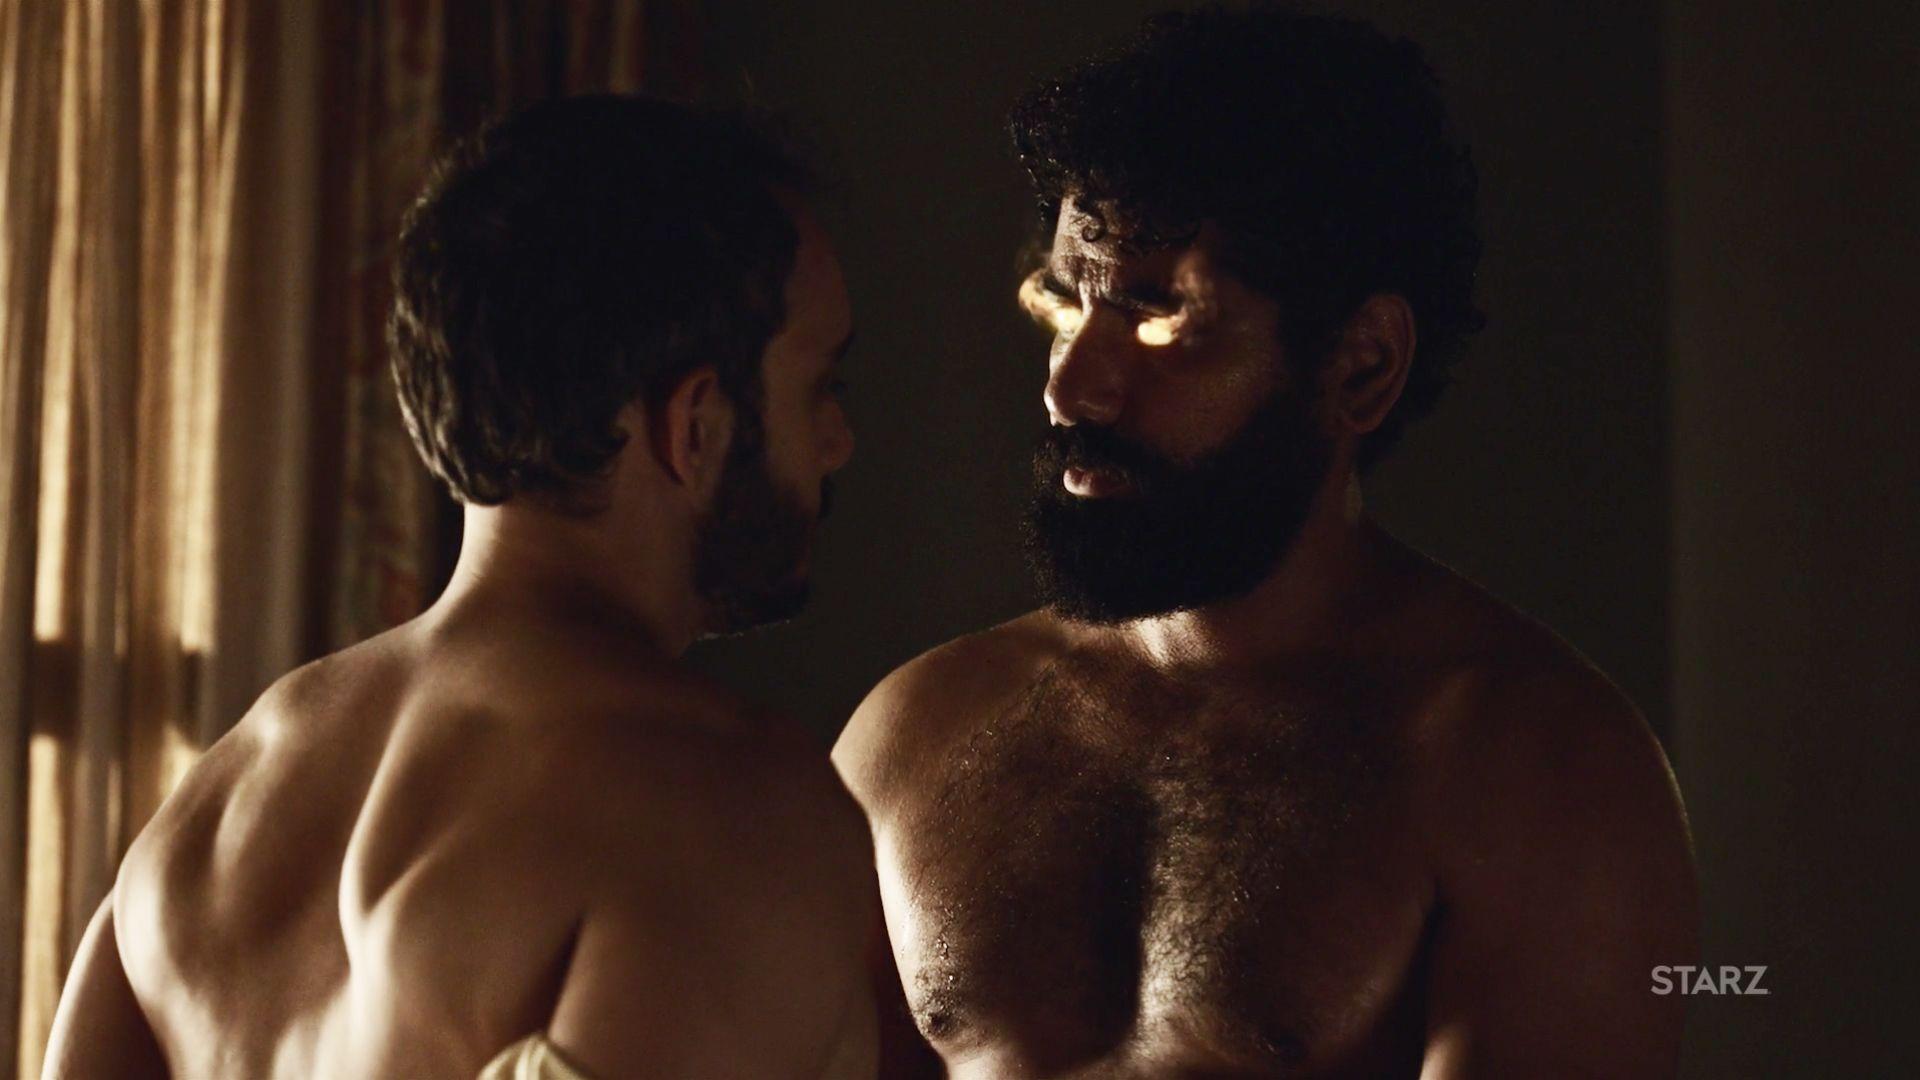 Hot american gay sex